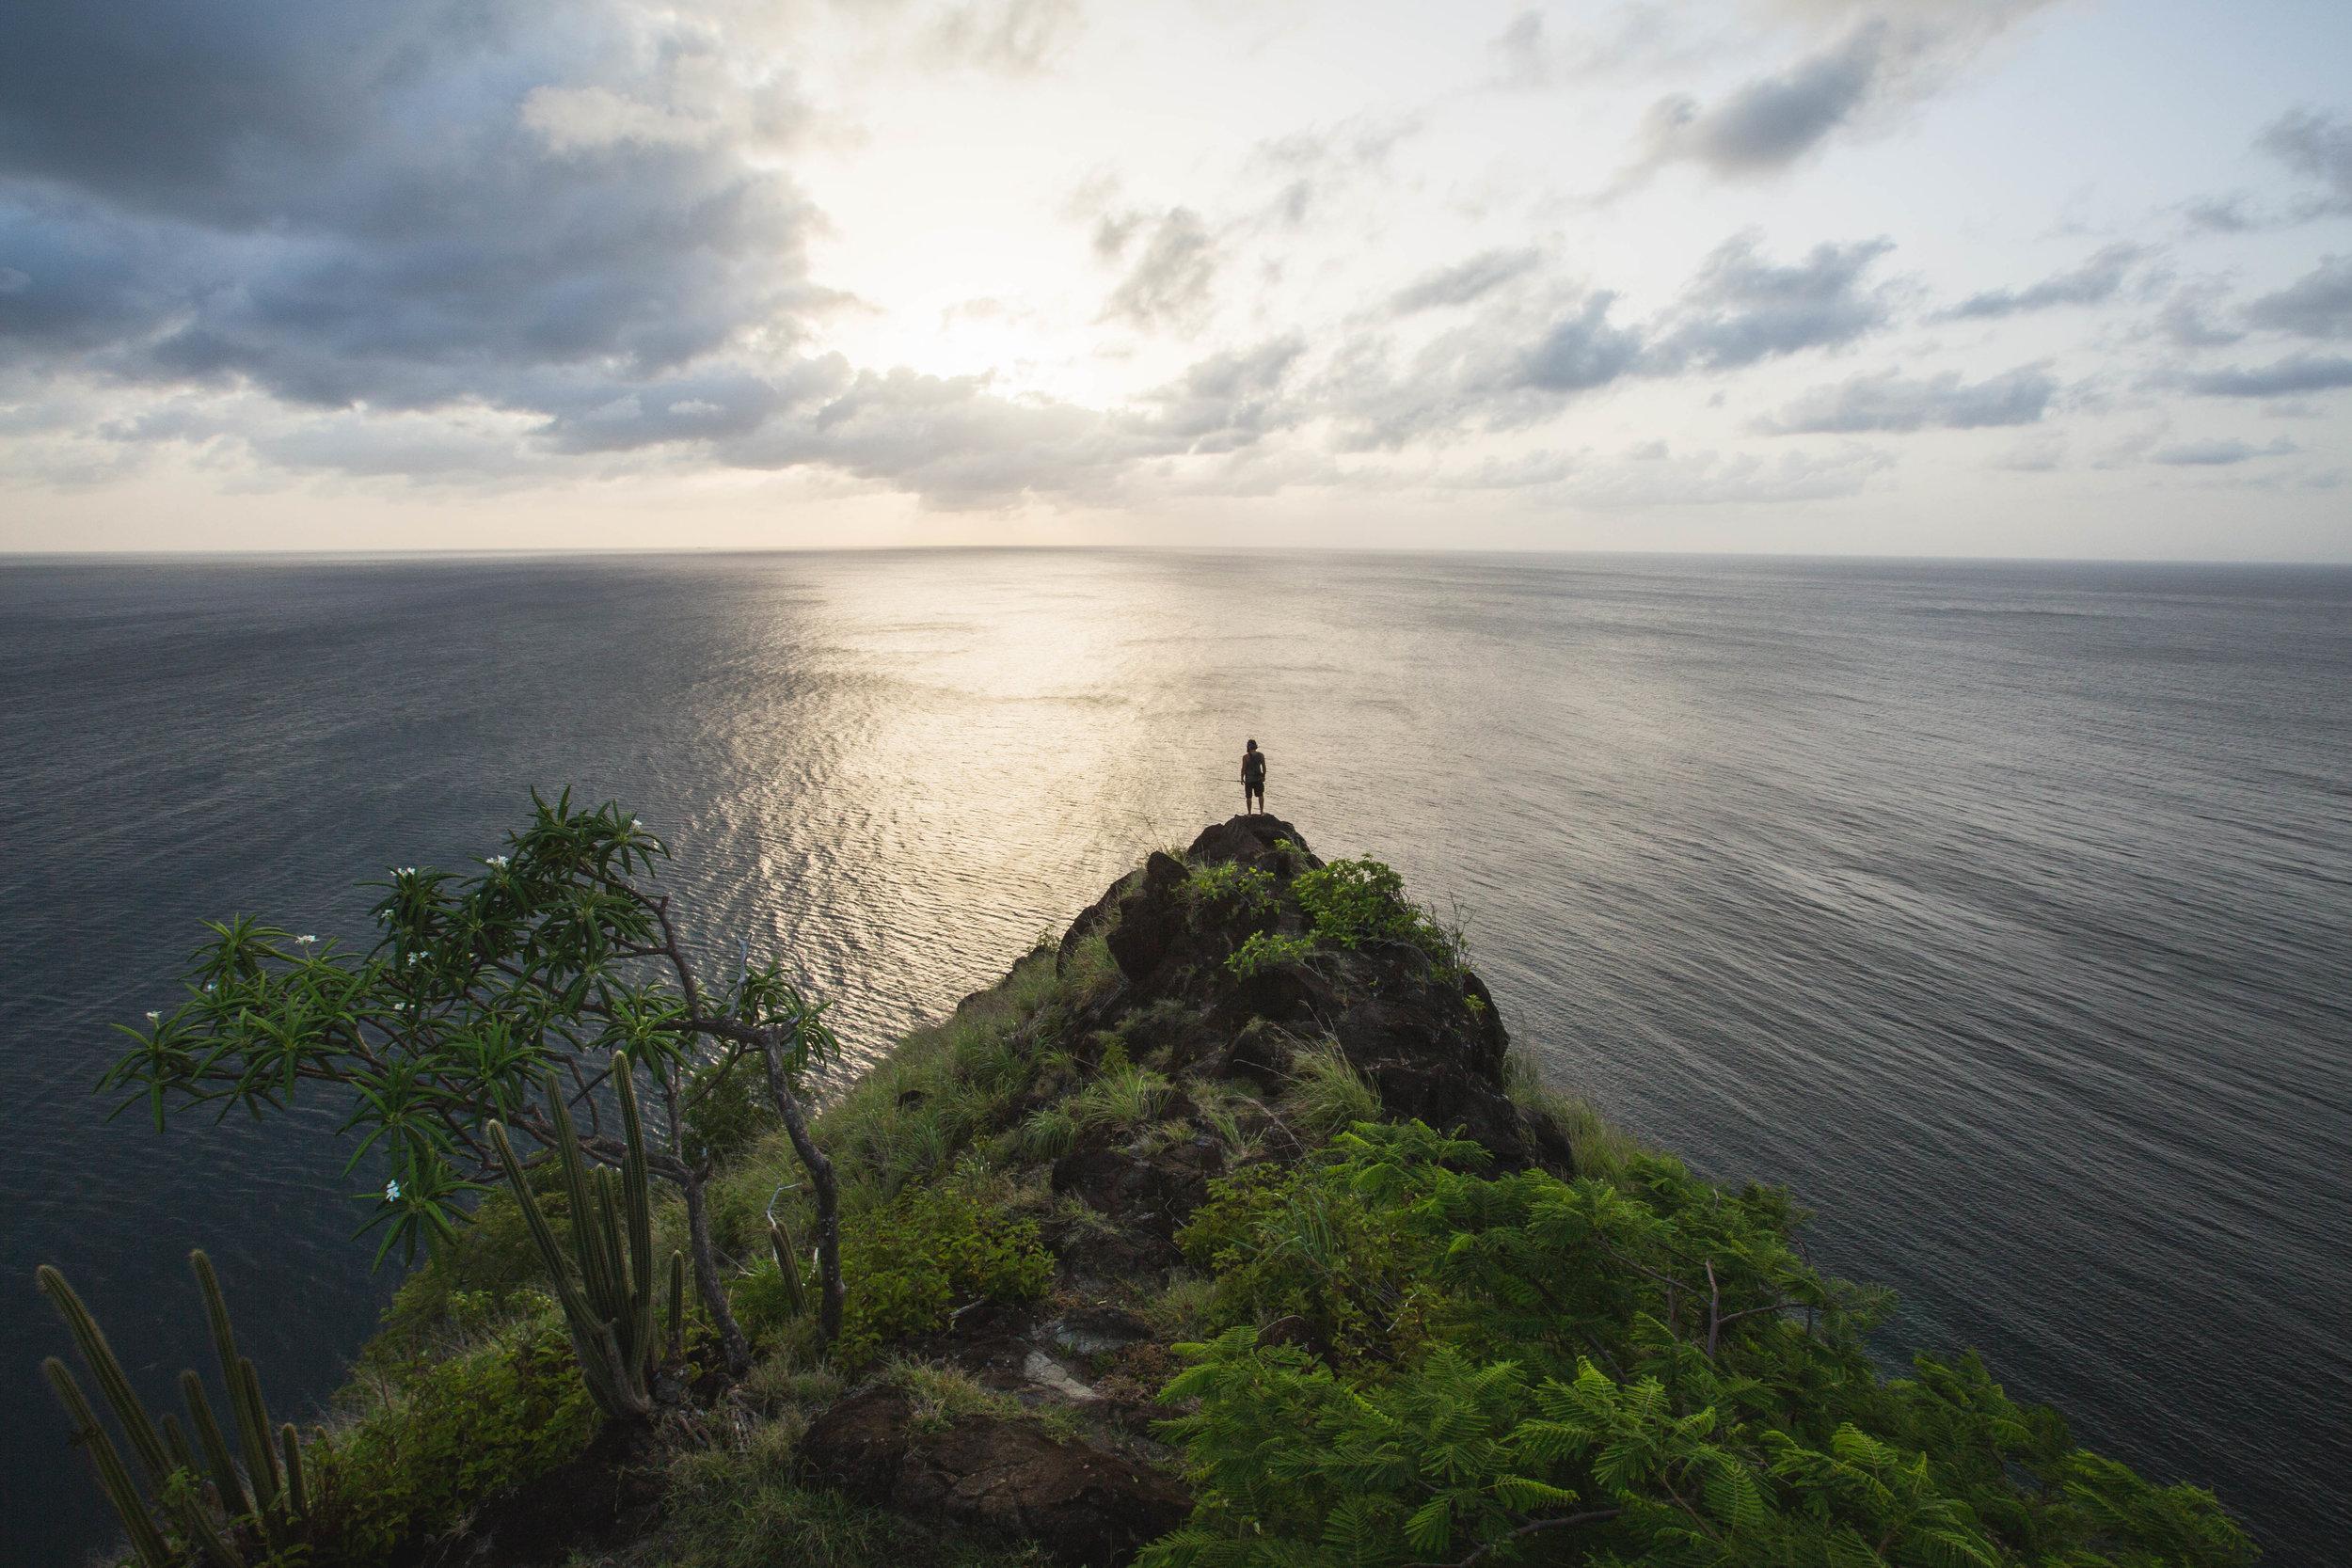 St. Lucia-20160613-2-.jpg